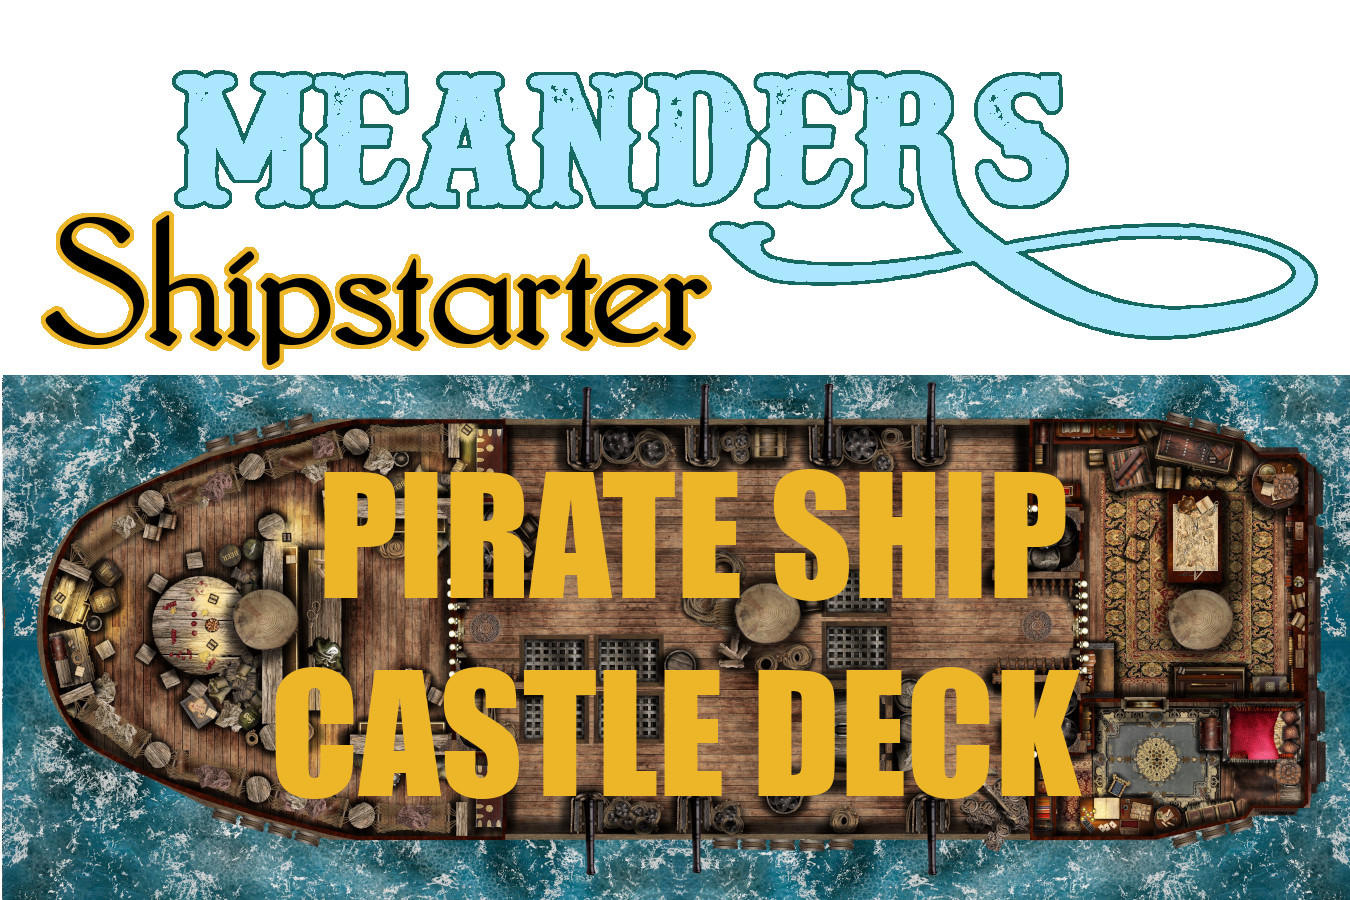 Shipstarter Pirate Galleon Castle Deck